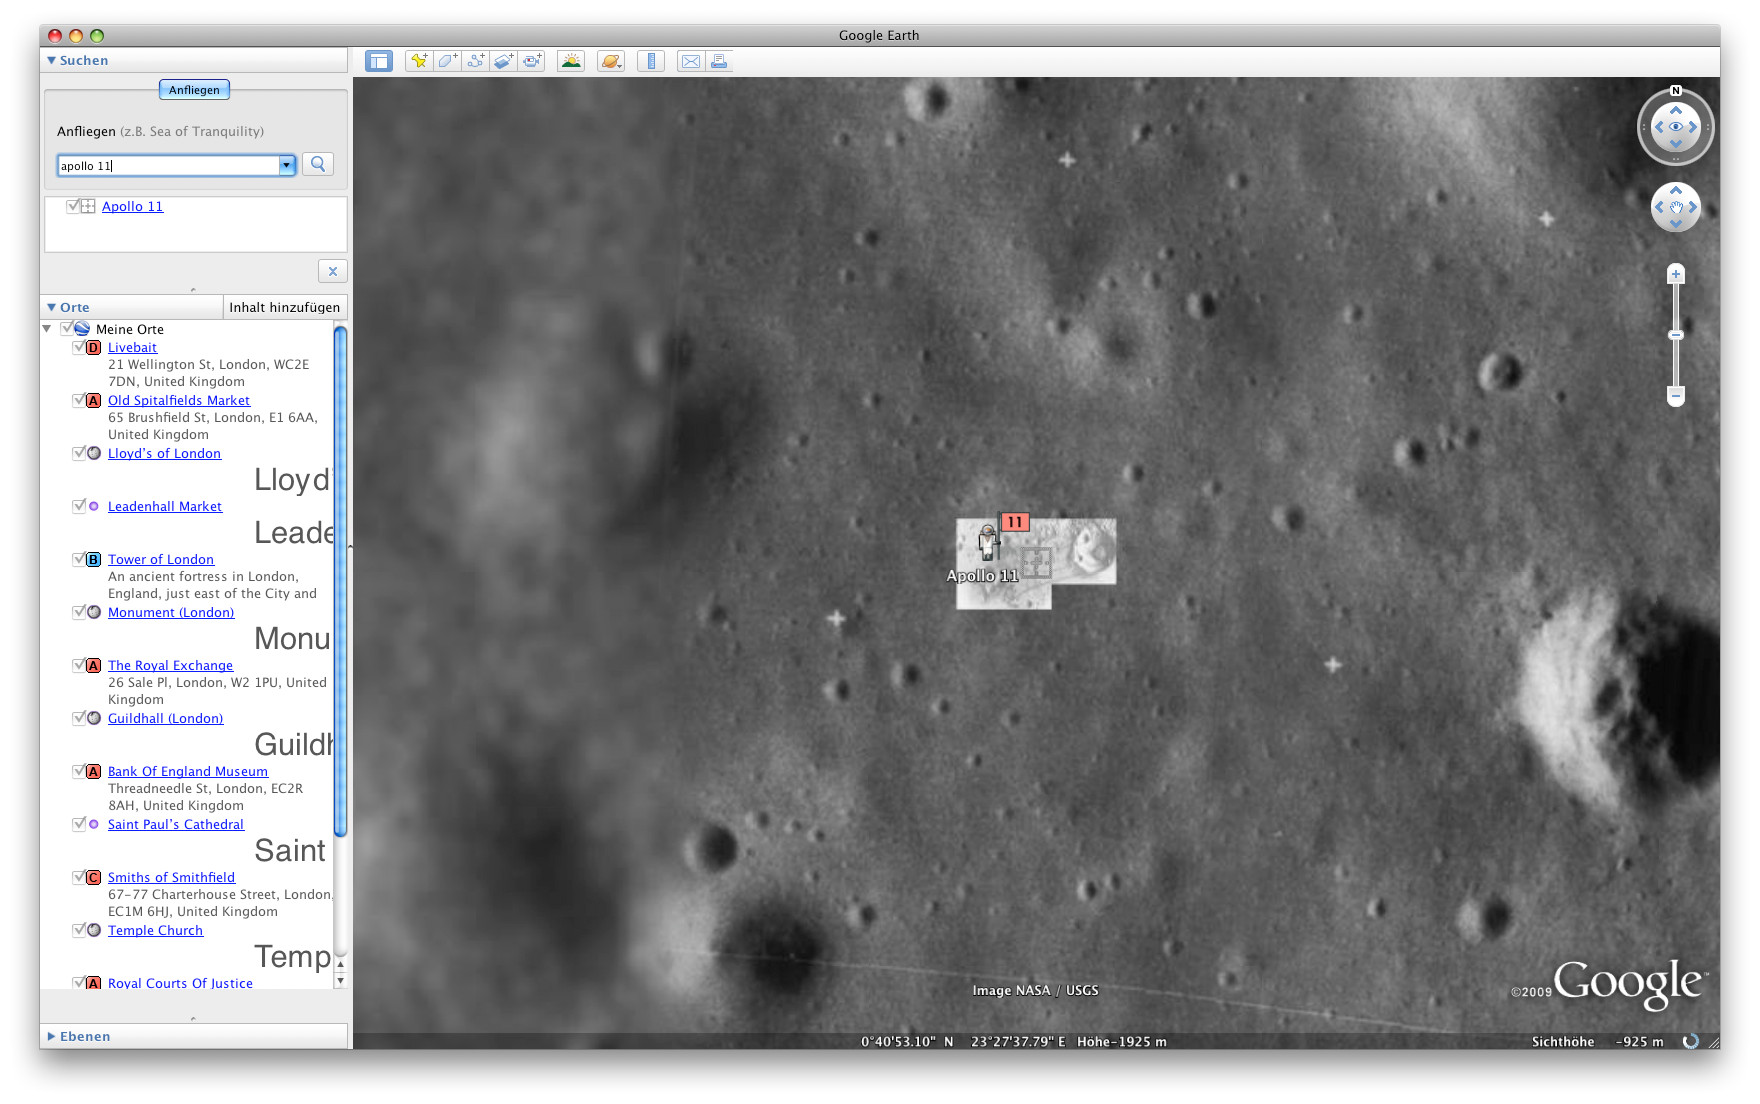 Mondforschung mit Google Earth - Der Mond in Google Earth